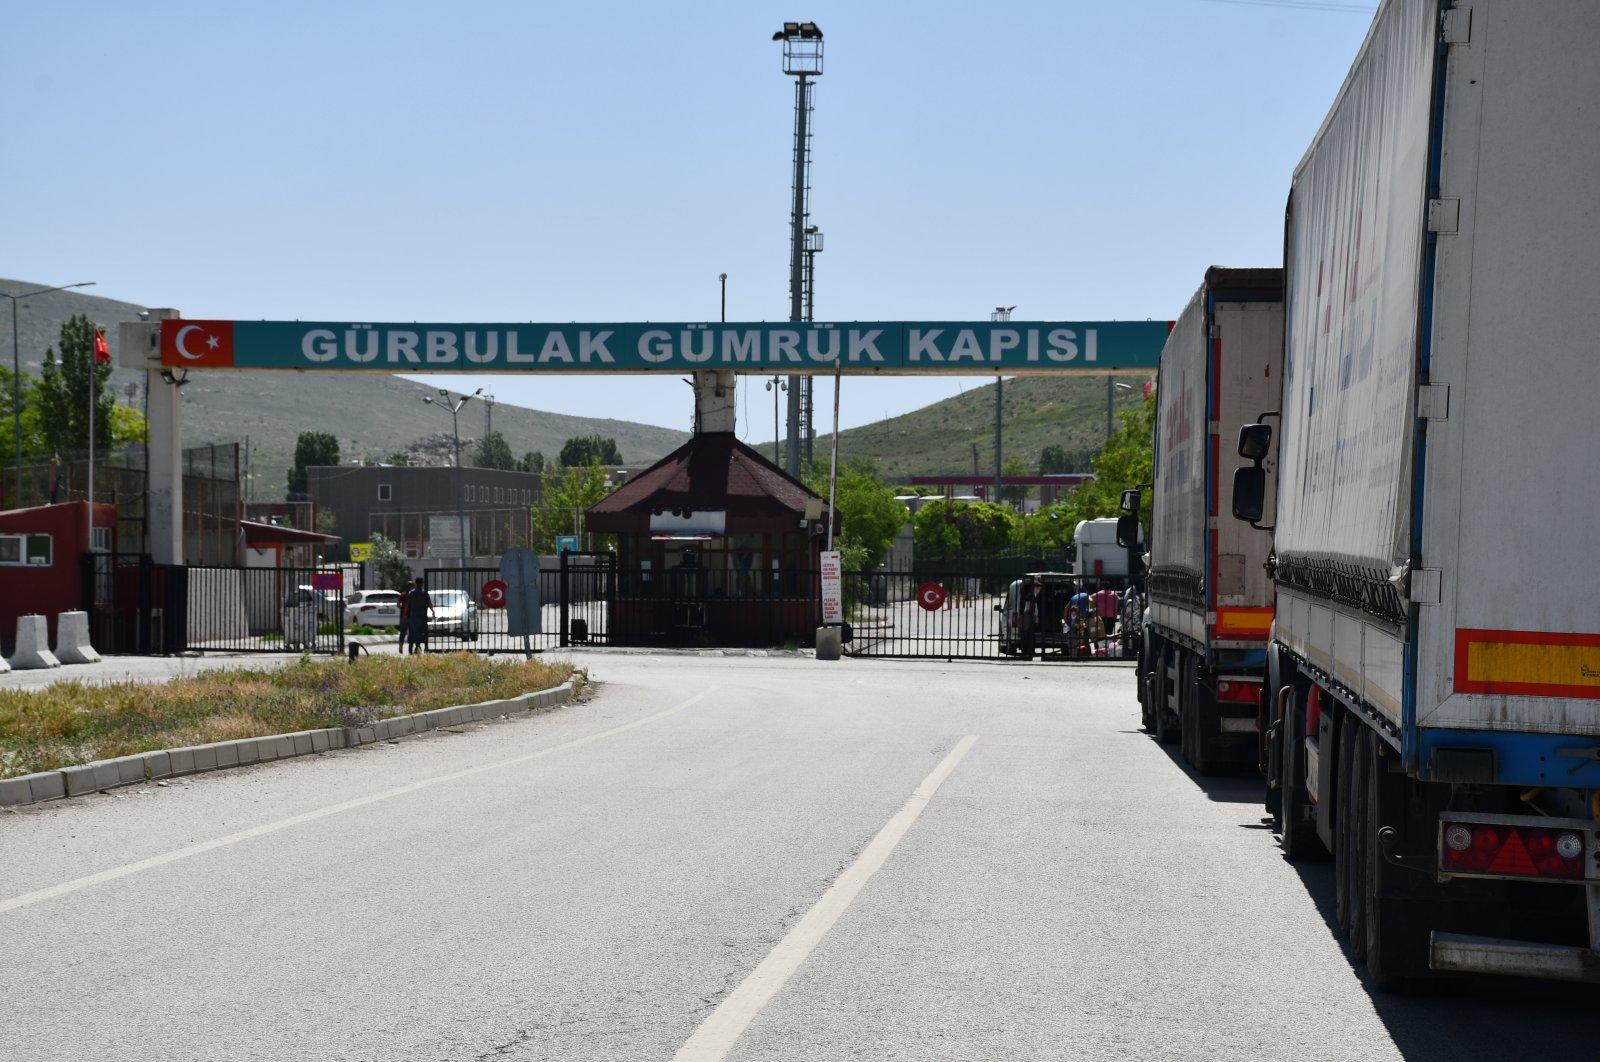 Trucks loaded with goods seen at the Gürbulak Border Gate on the Turkey-Iran border, Ağrı province, eastern Turkey, April 6, 2020. (AA Photo)